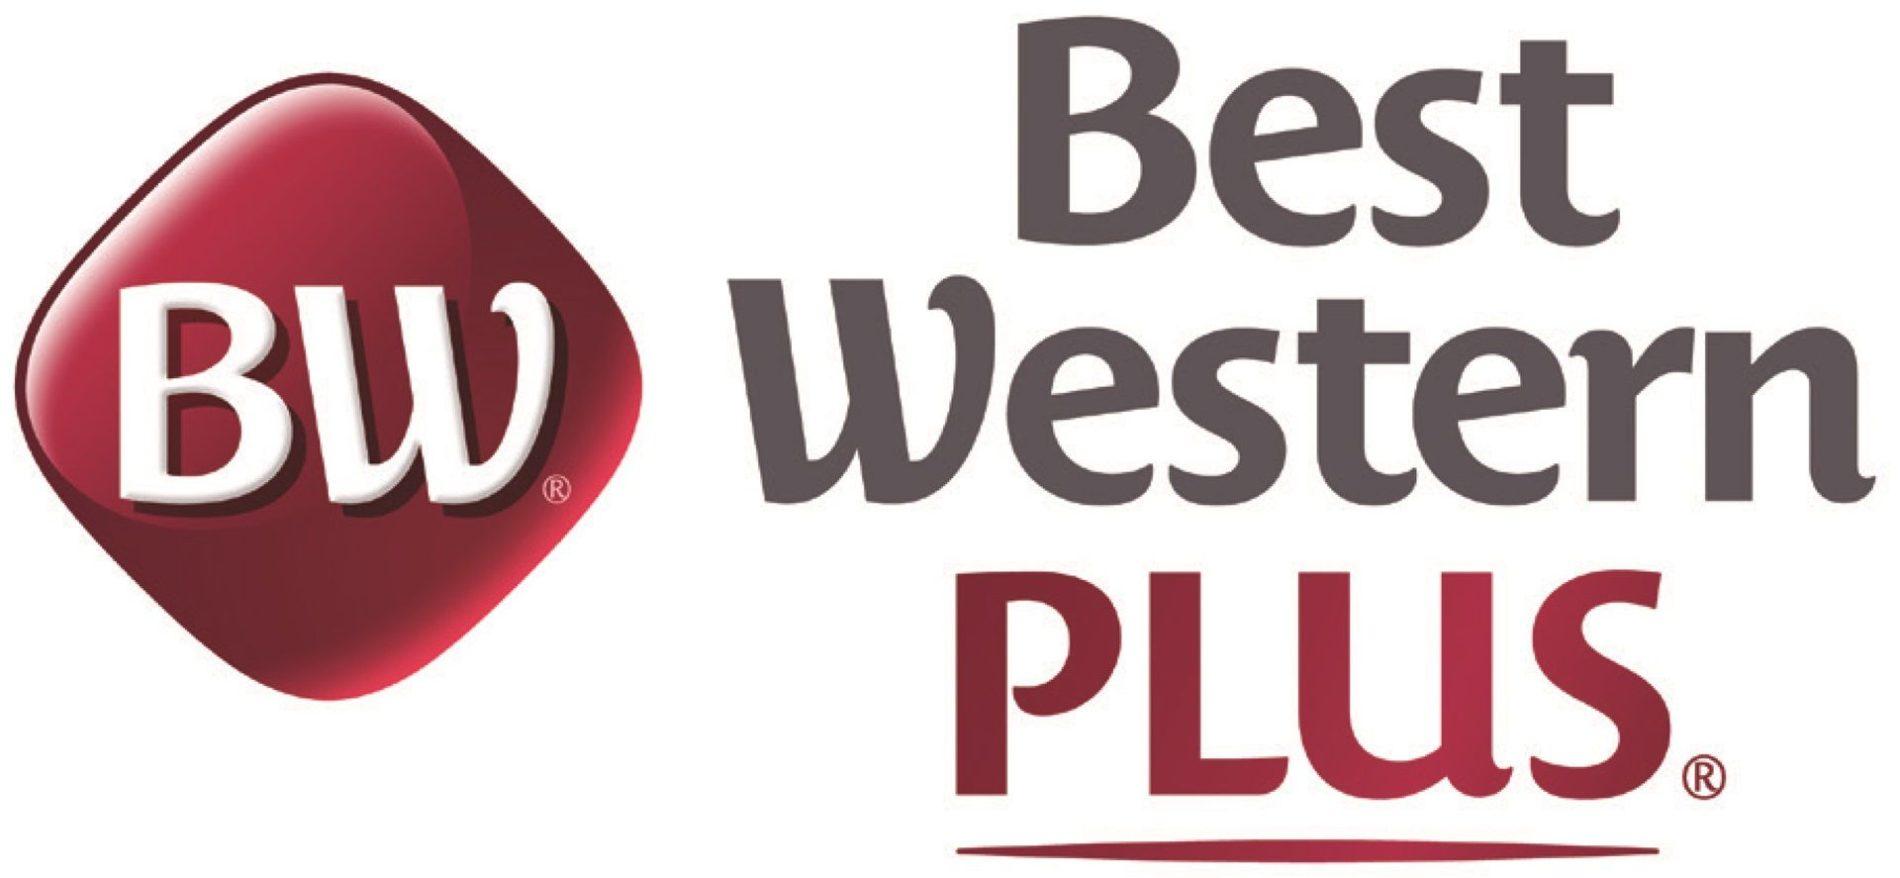 BEST WESTERN PLUS